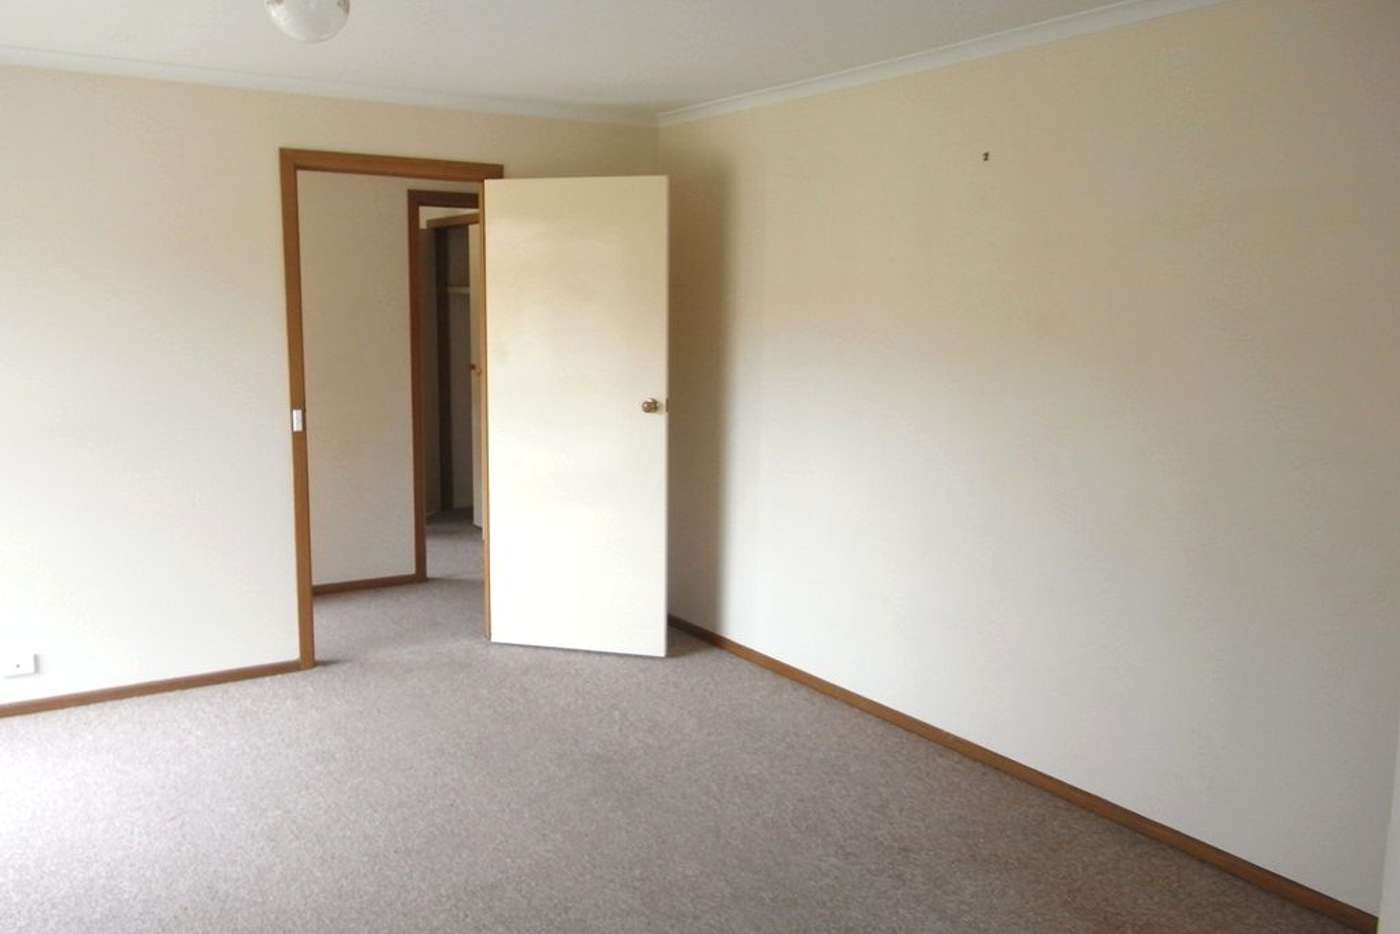 Seventh view of Homely unit listing, 4/272 Albert Street, Sebastopol VIC 3356